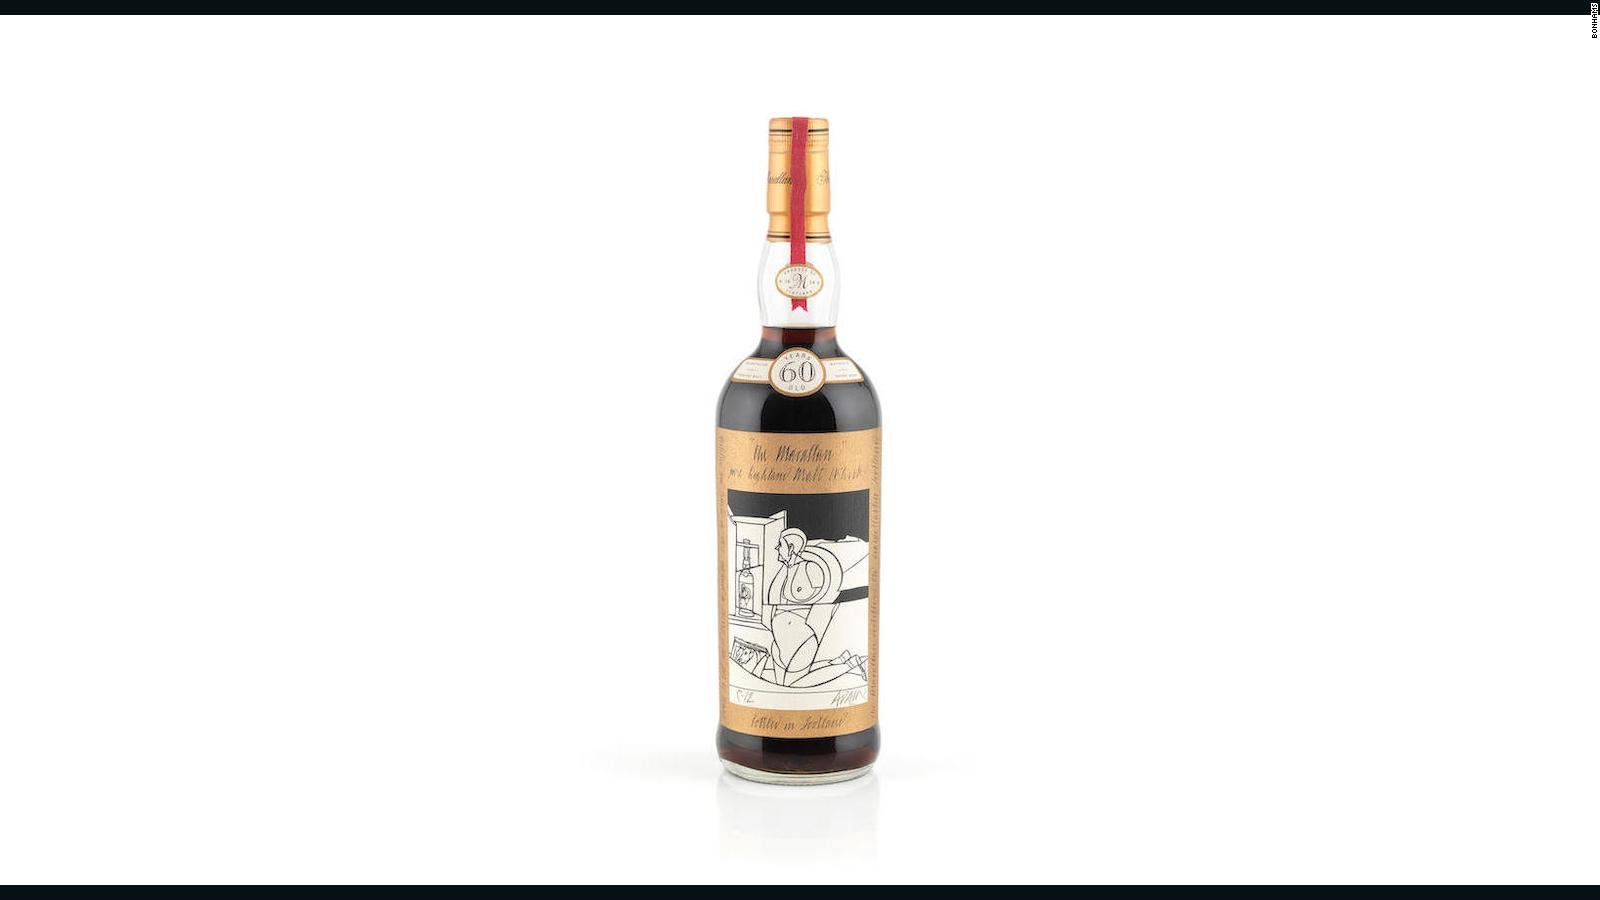 Bottle Of Whisky Sold For World Record 11 Million